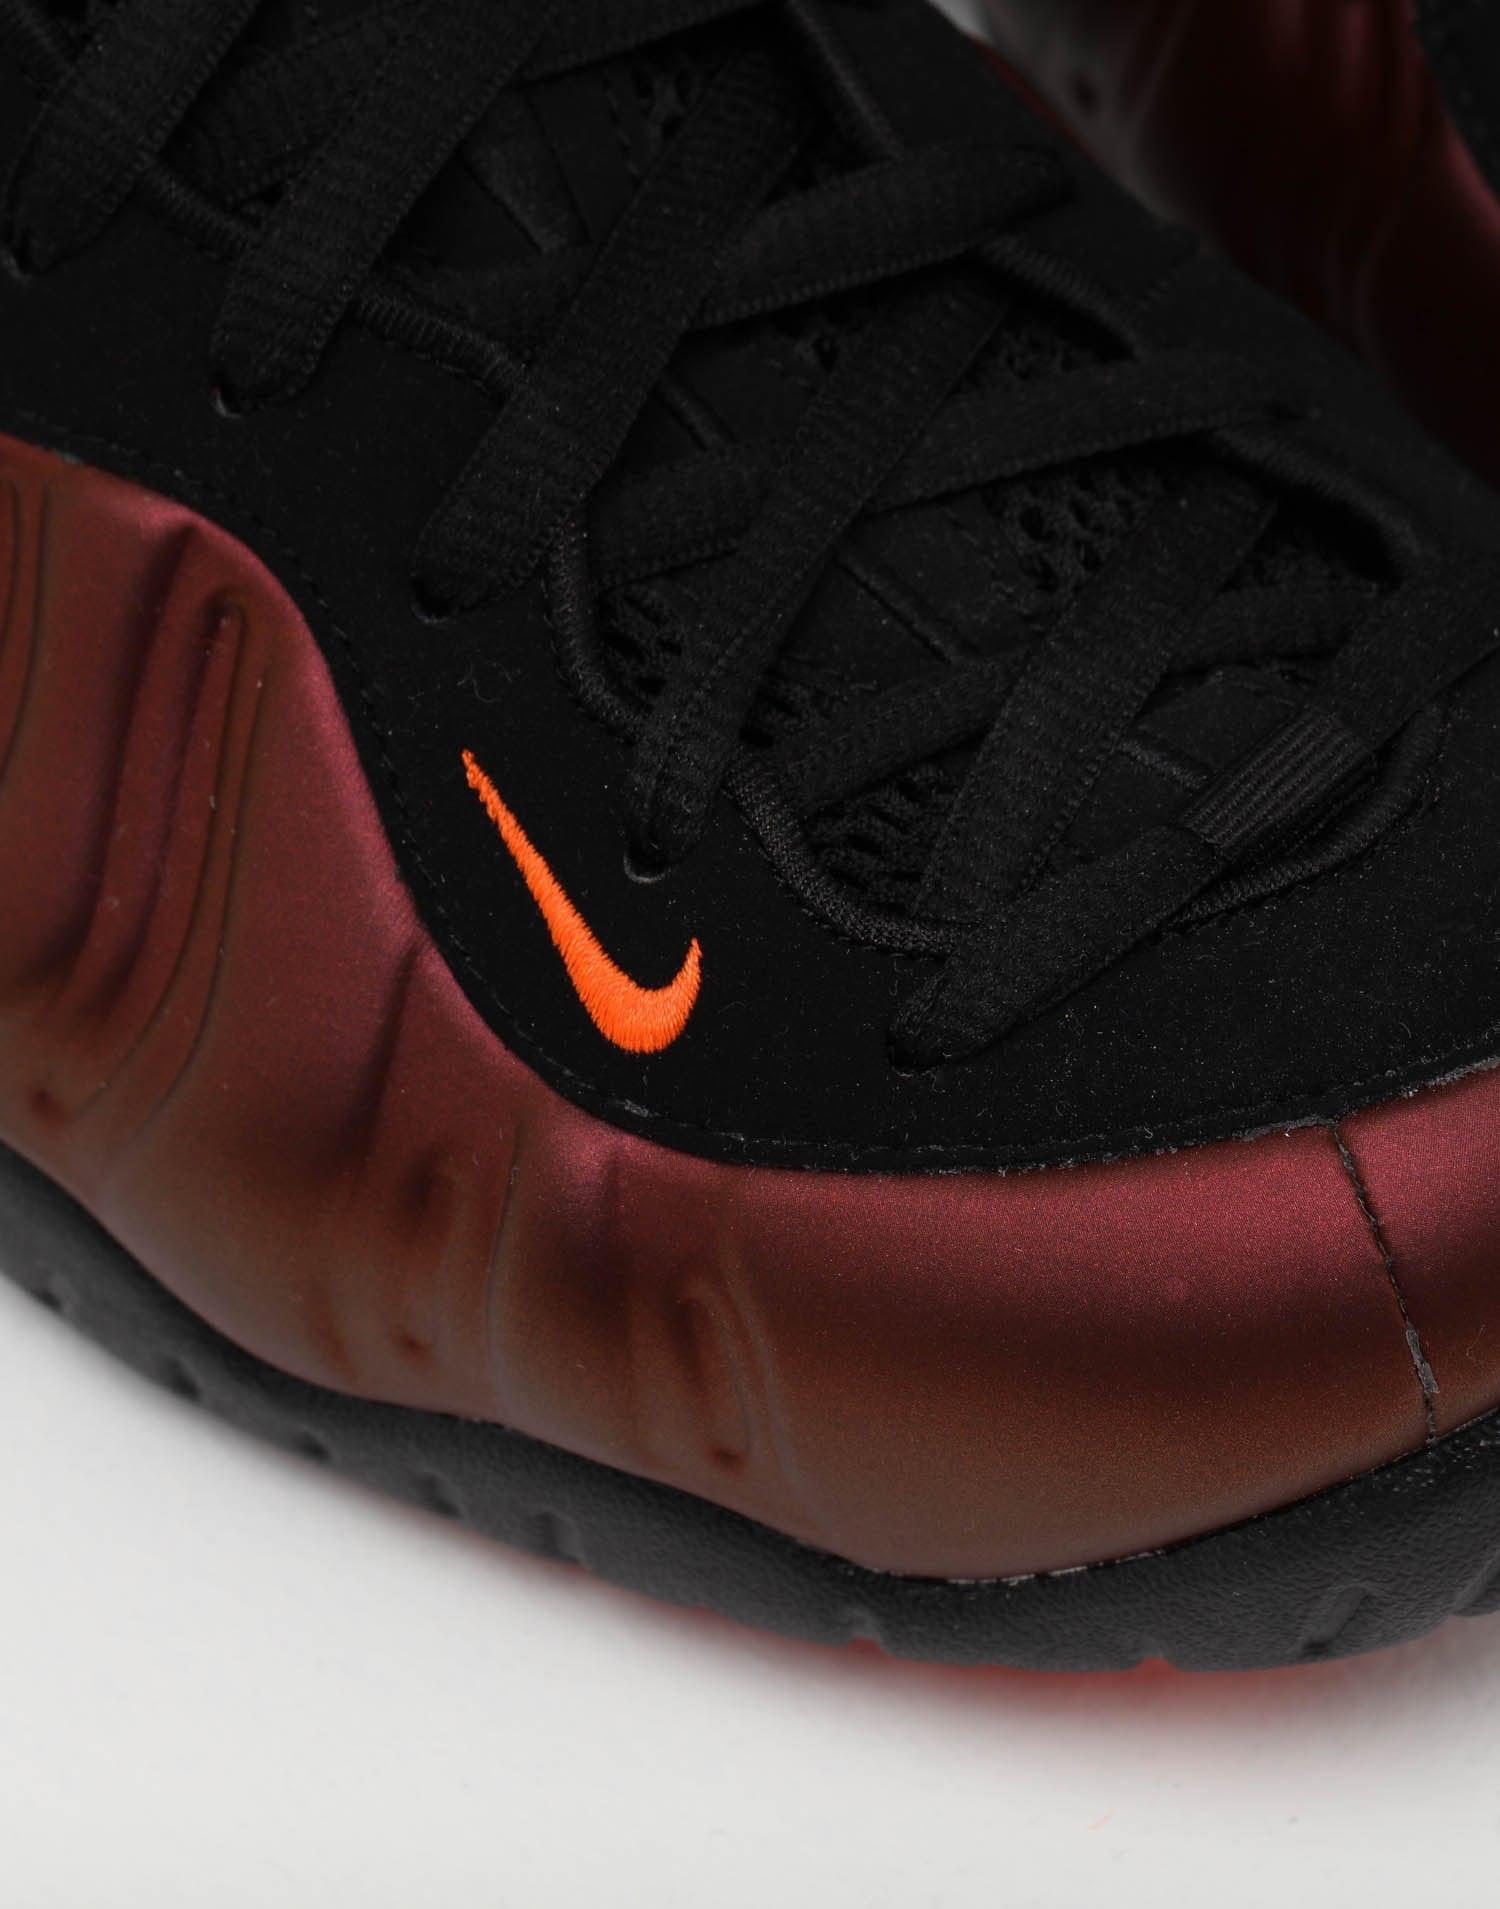 Cheap Nike Shoes Nike Air Foamposite Pro Army Camo ...